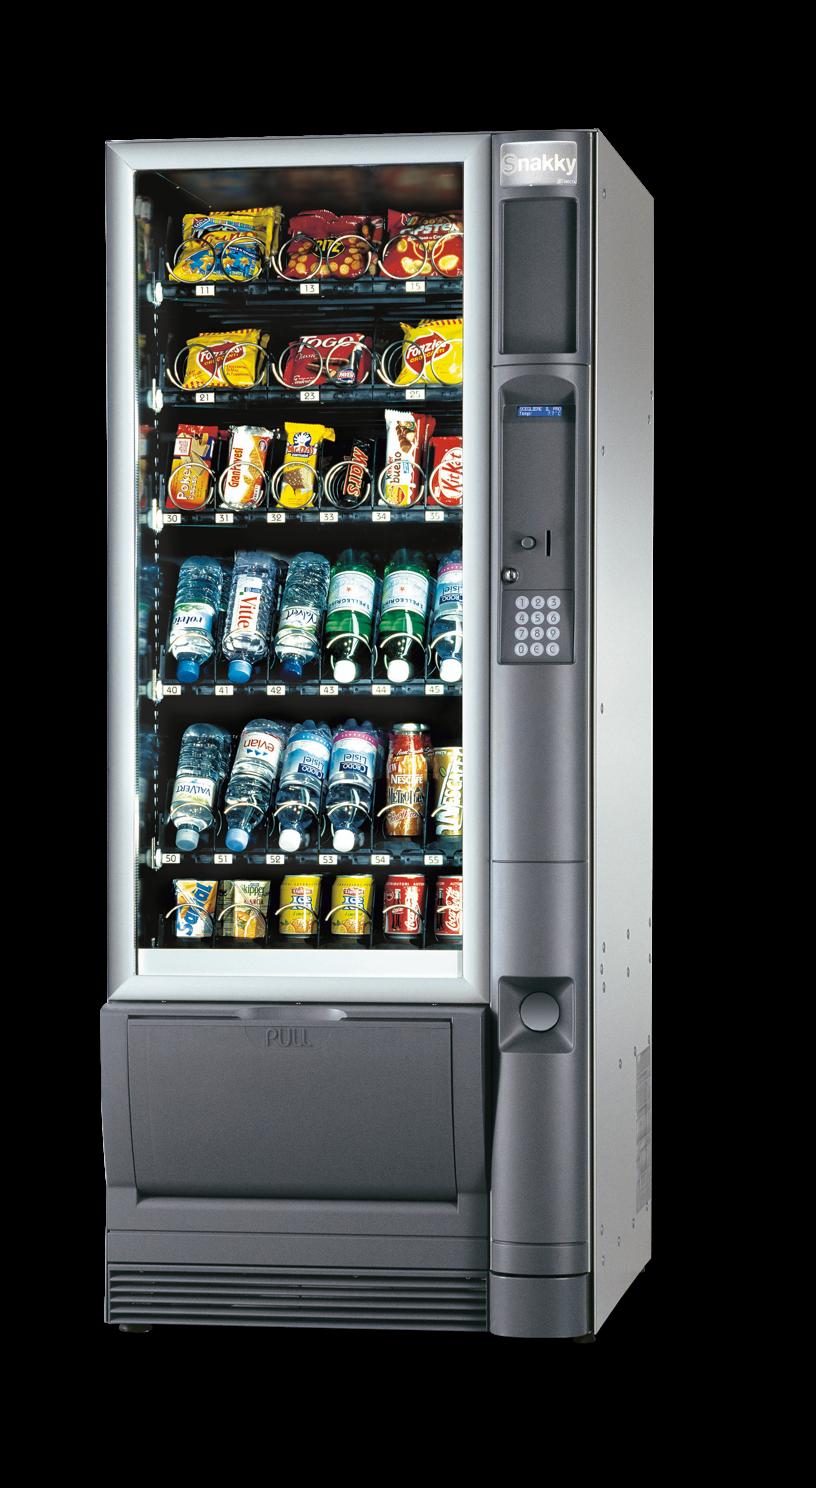 Máquina Vending Alimentos y Bebidas Frías: SNAKKY